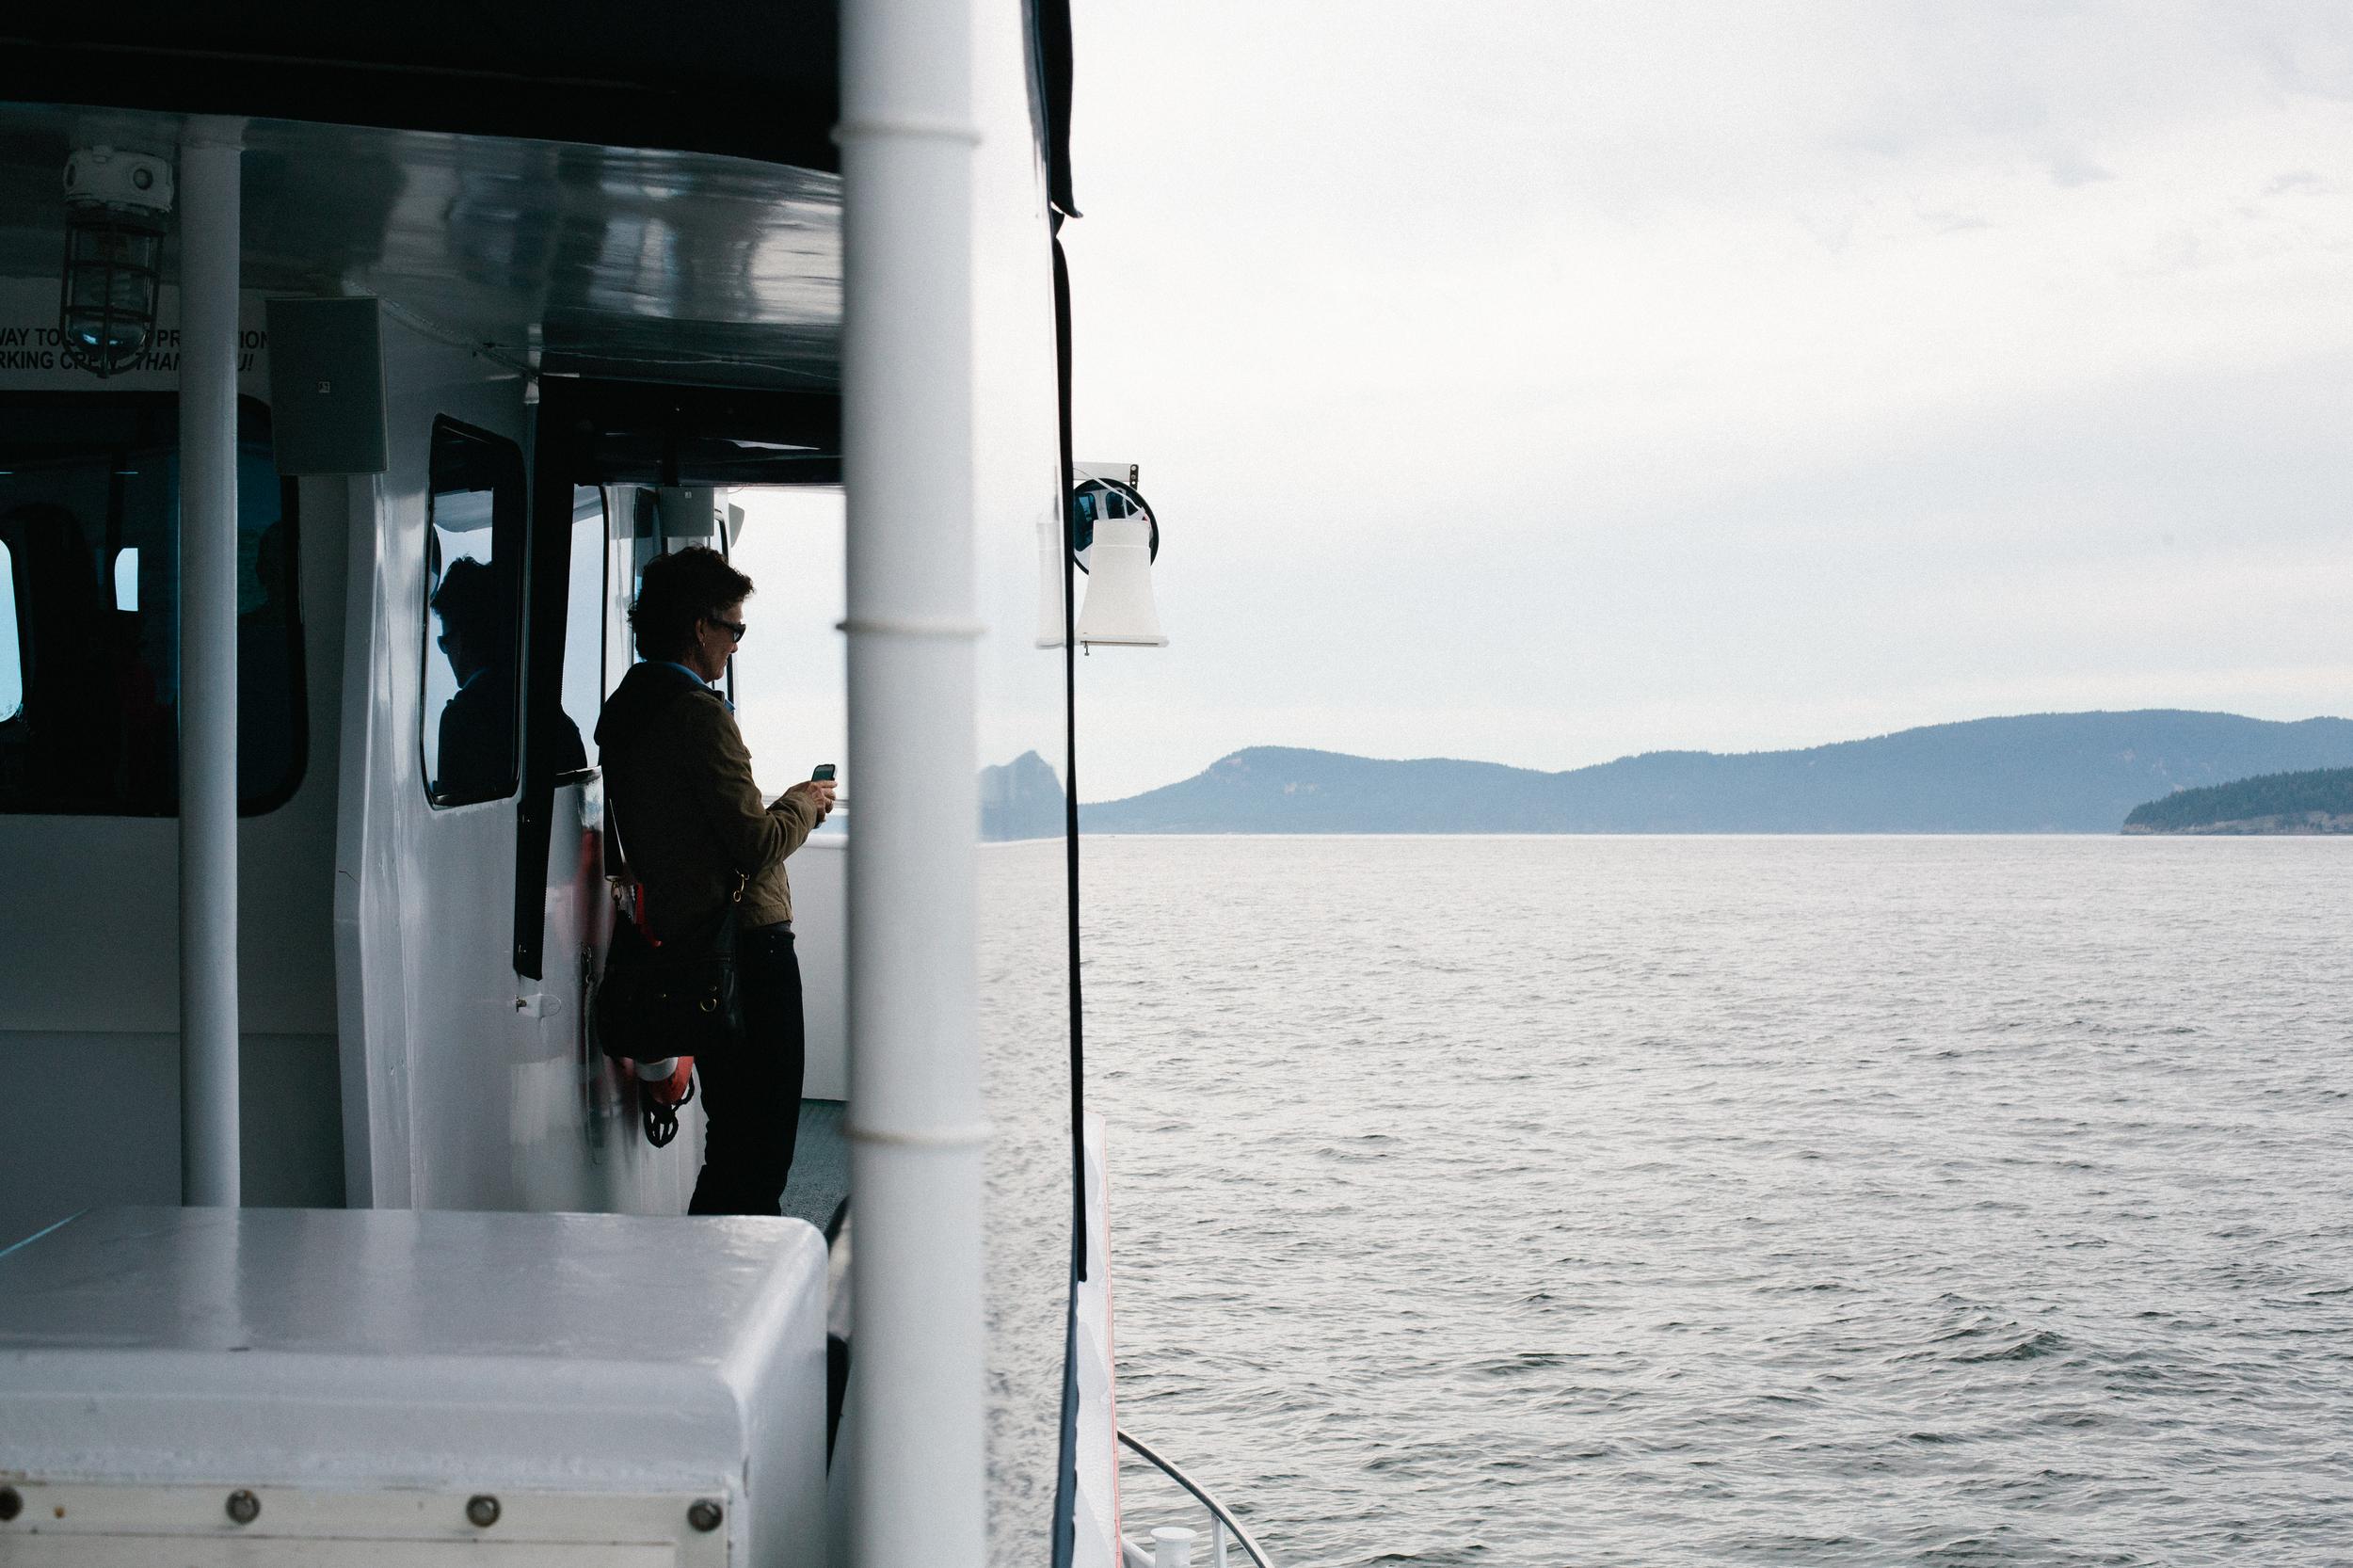 seattle whale watching anacortes washington